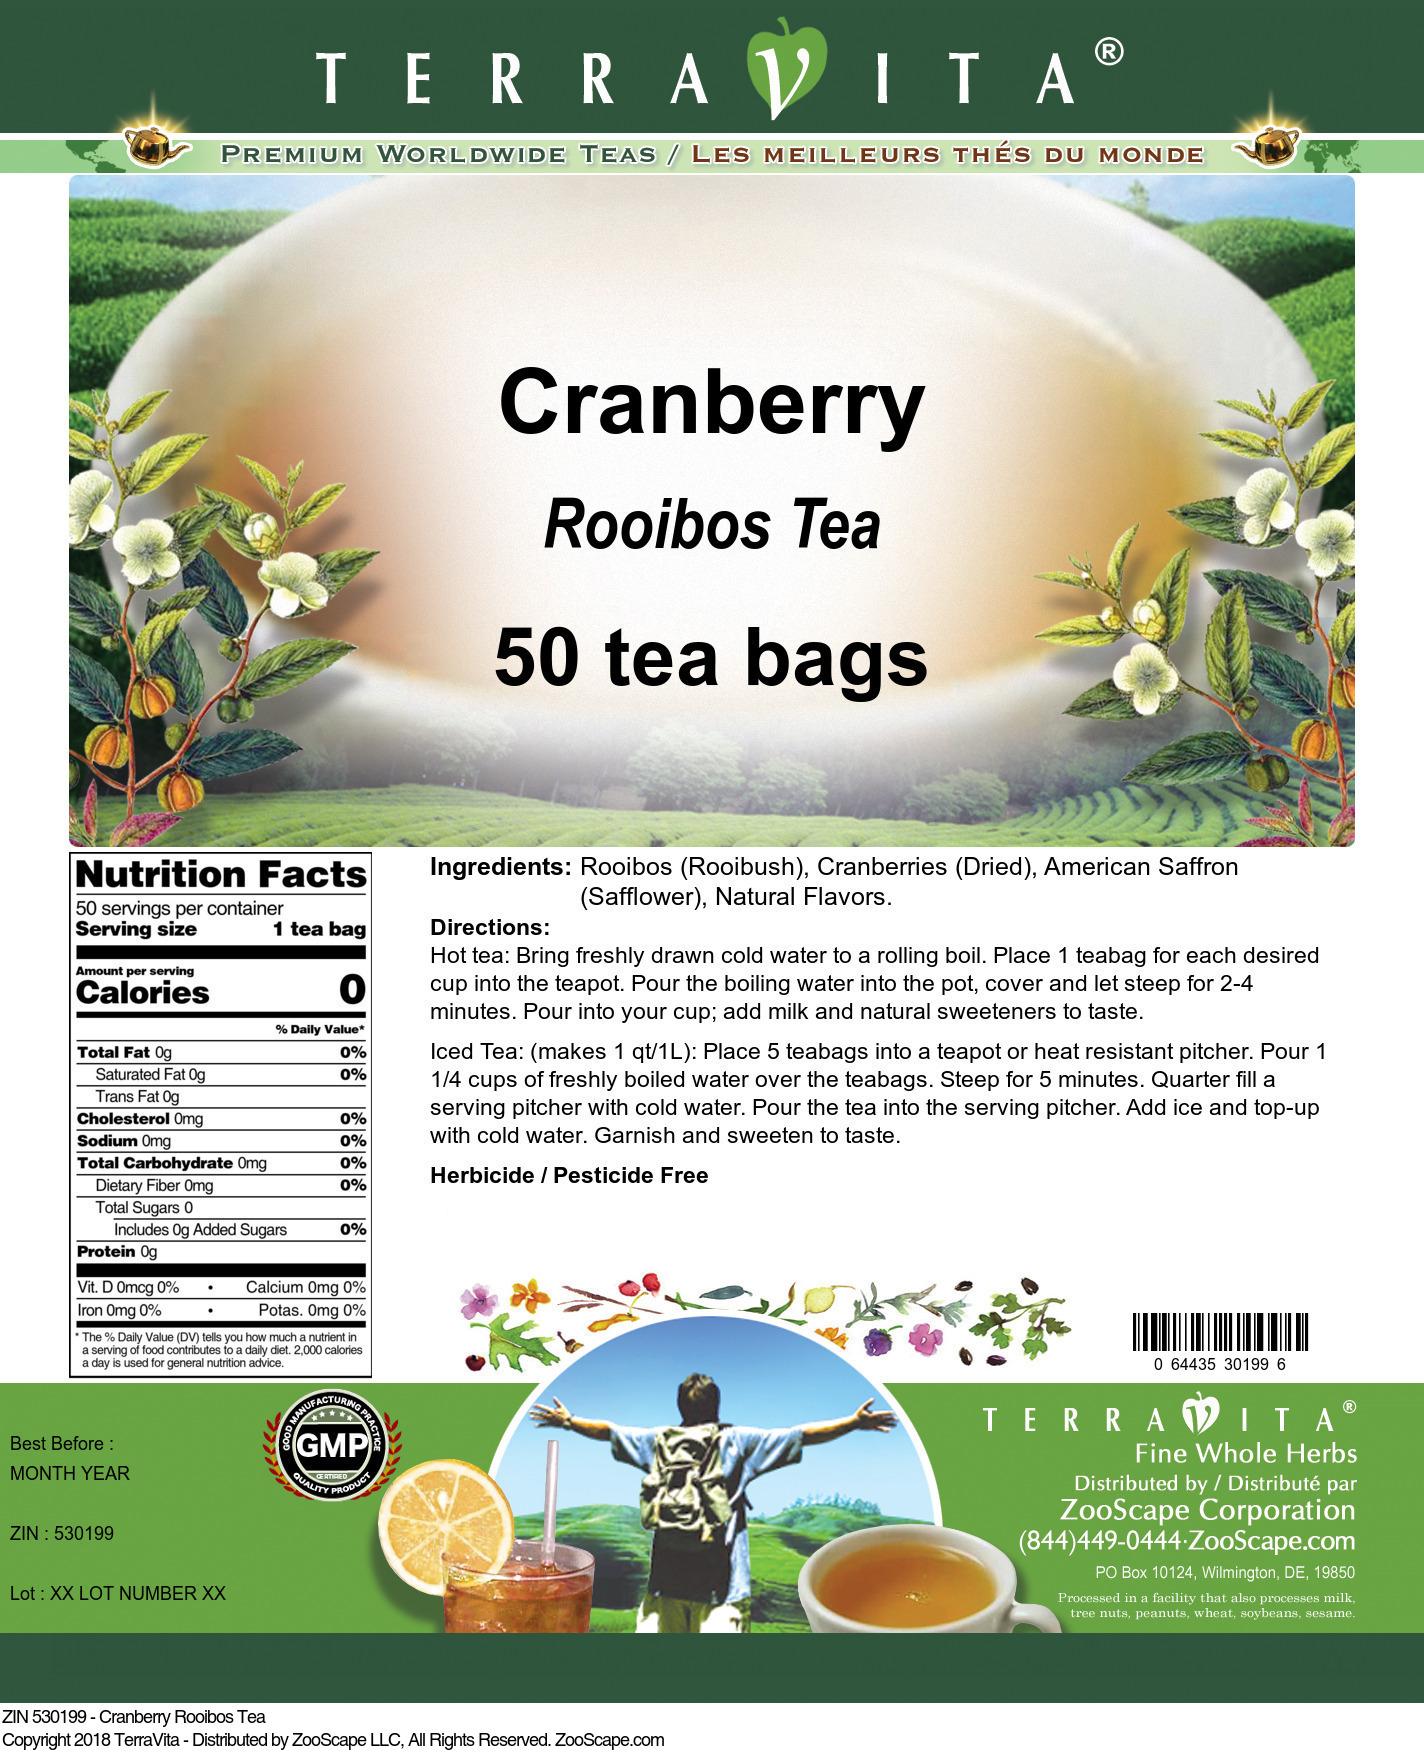 Cranberry Rooibos Tea